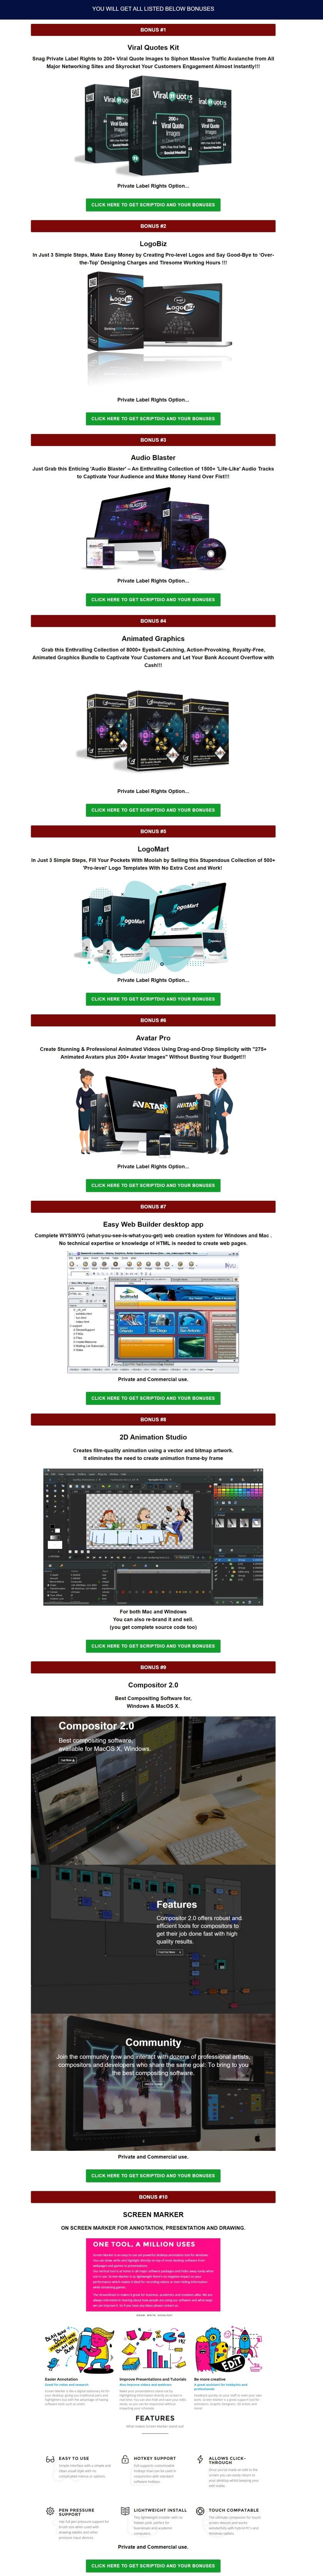 Marketing Software: SciptDio is A New-Generation Technology Marketing Script Manipulator